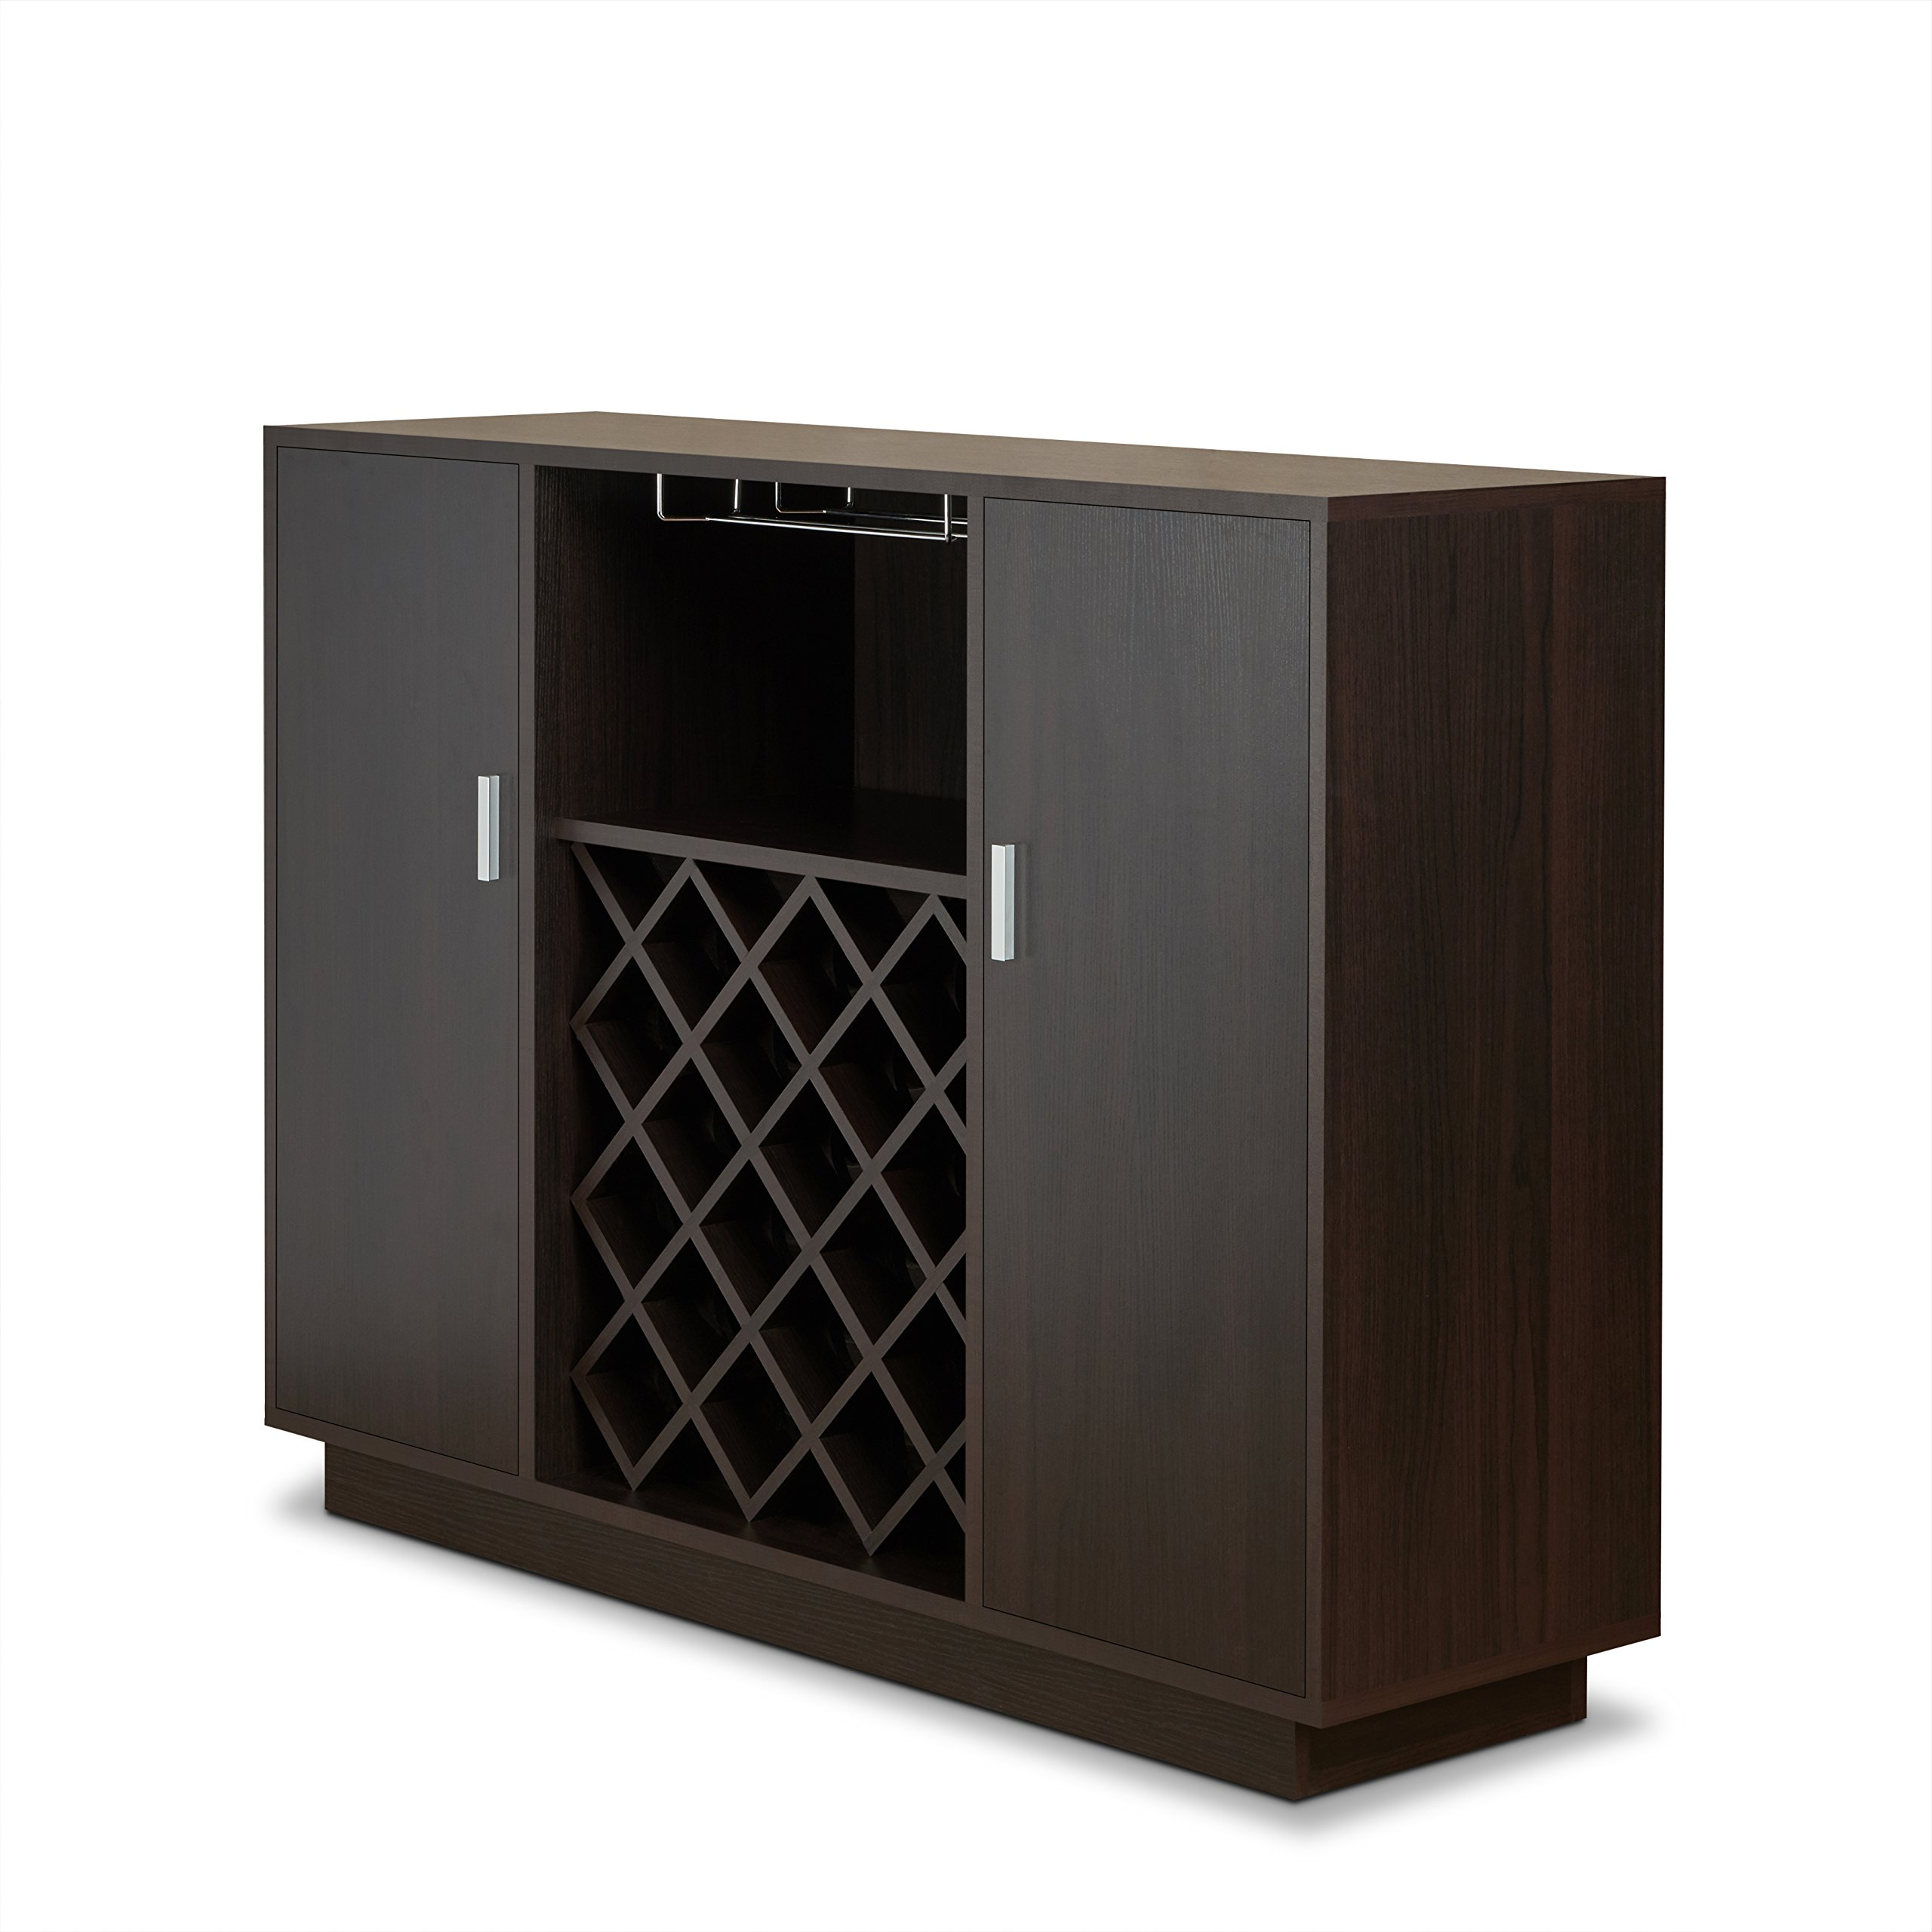 ACME Furniture Hazen Espresso Server by Acme Furniture